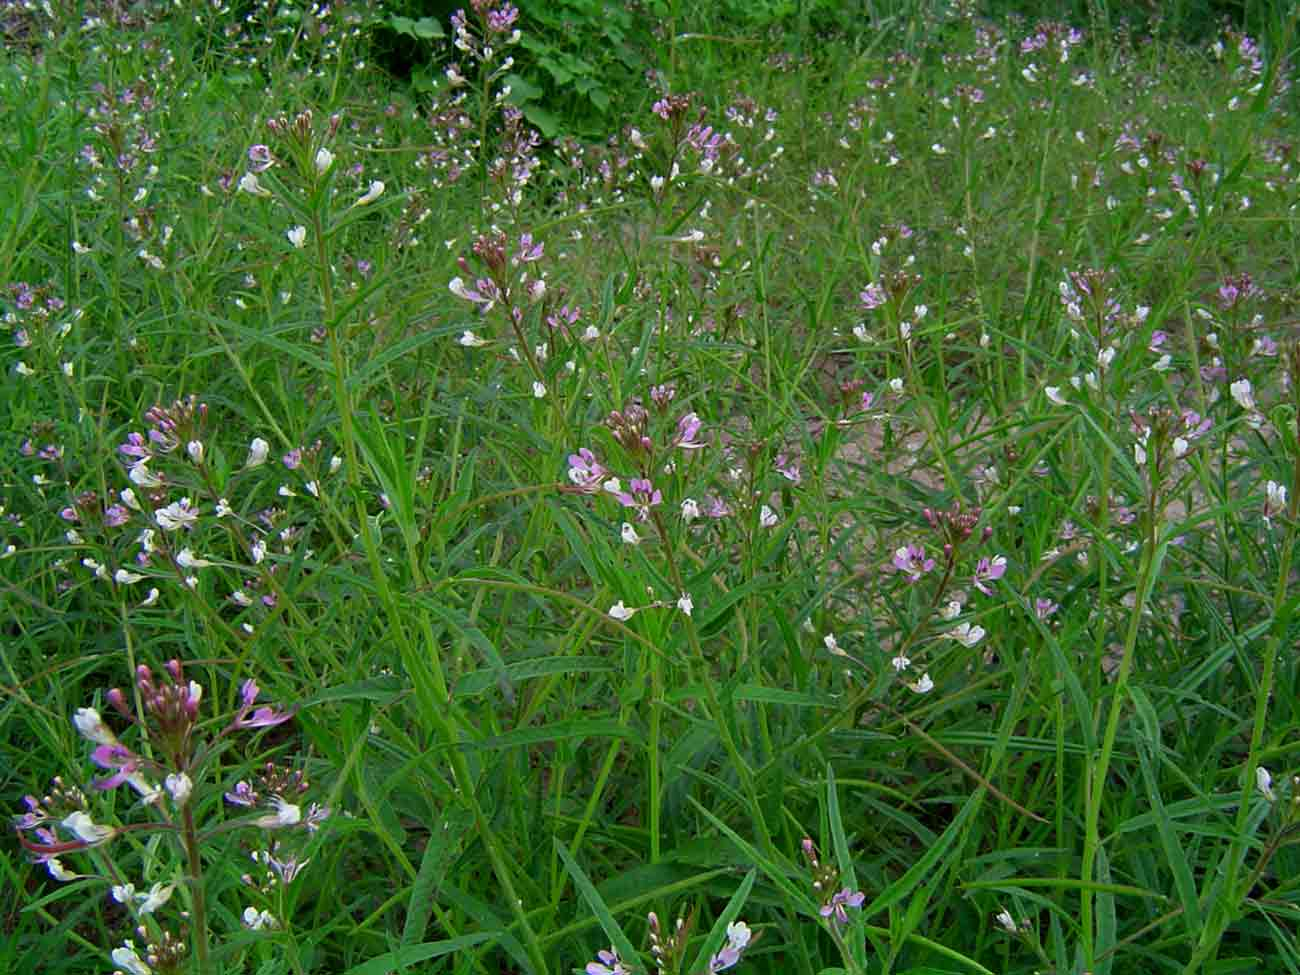 Cleome monophylla